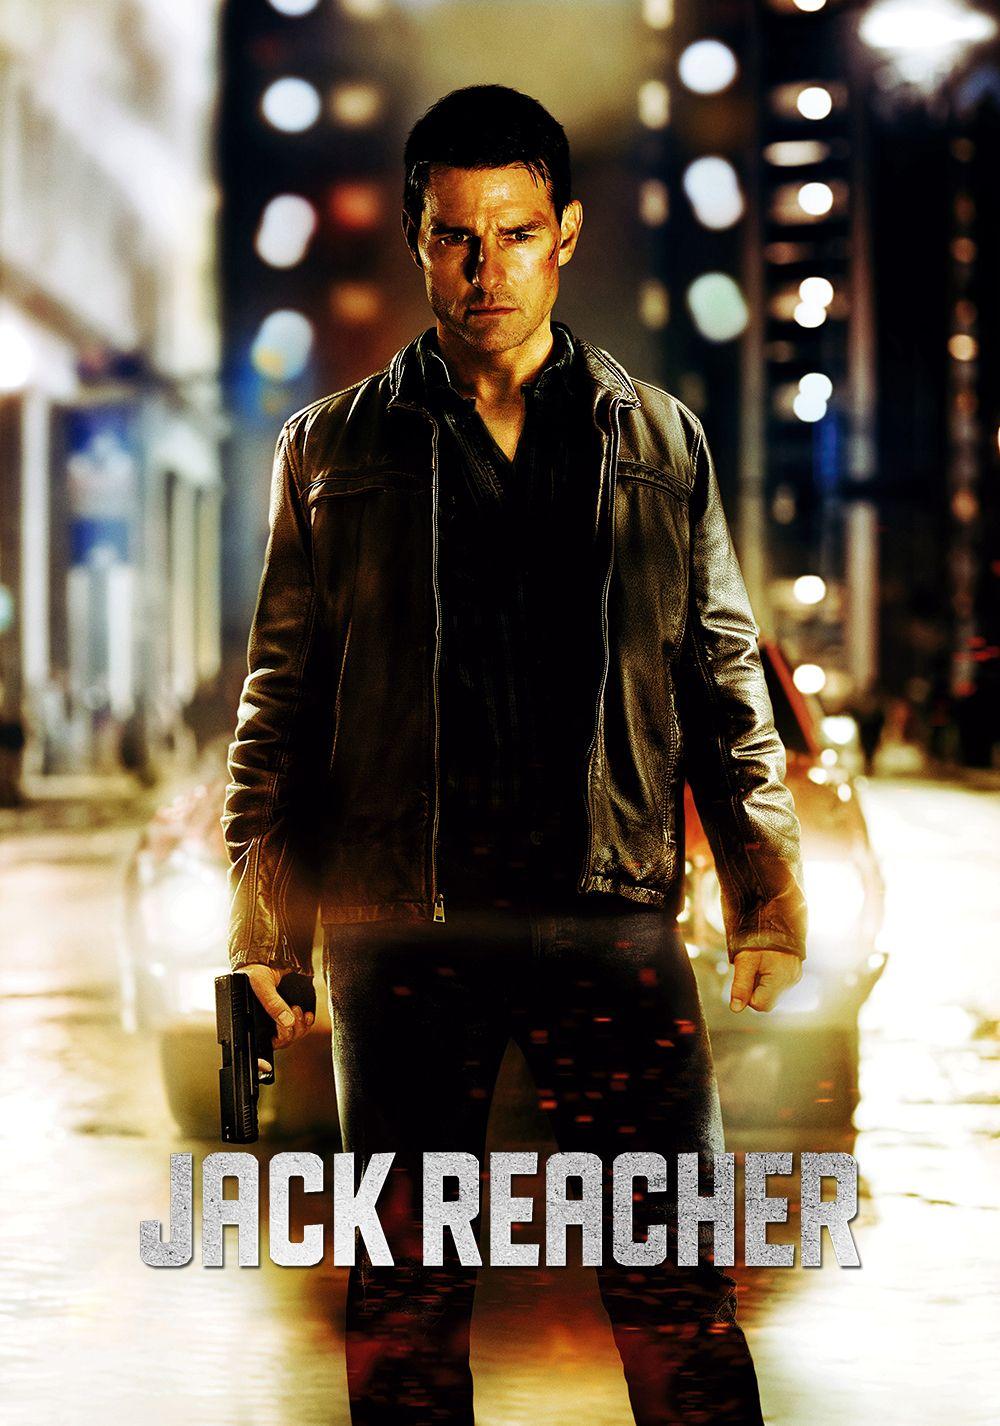 Jack Reacher 2012 Jack Reacher Movie Jack Reacher Movies